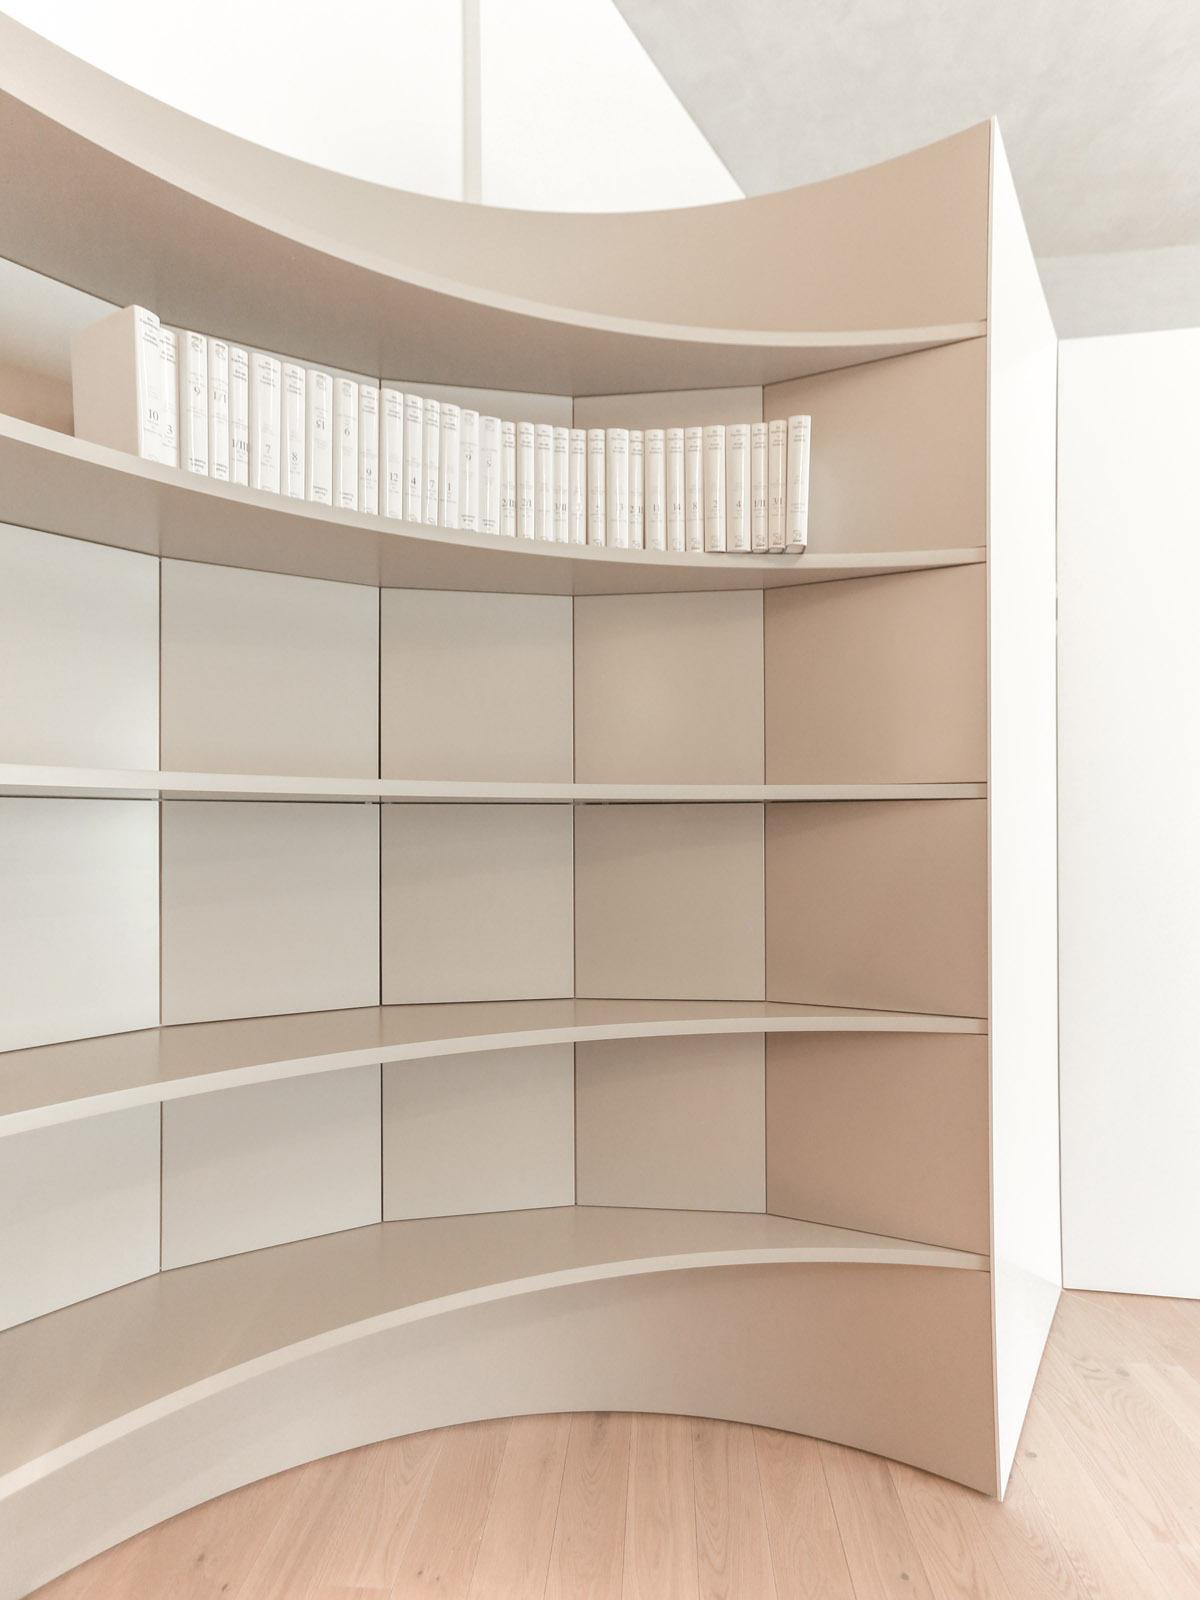 Richard-Moessmer-Bibliothek-7